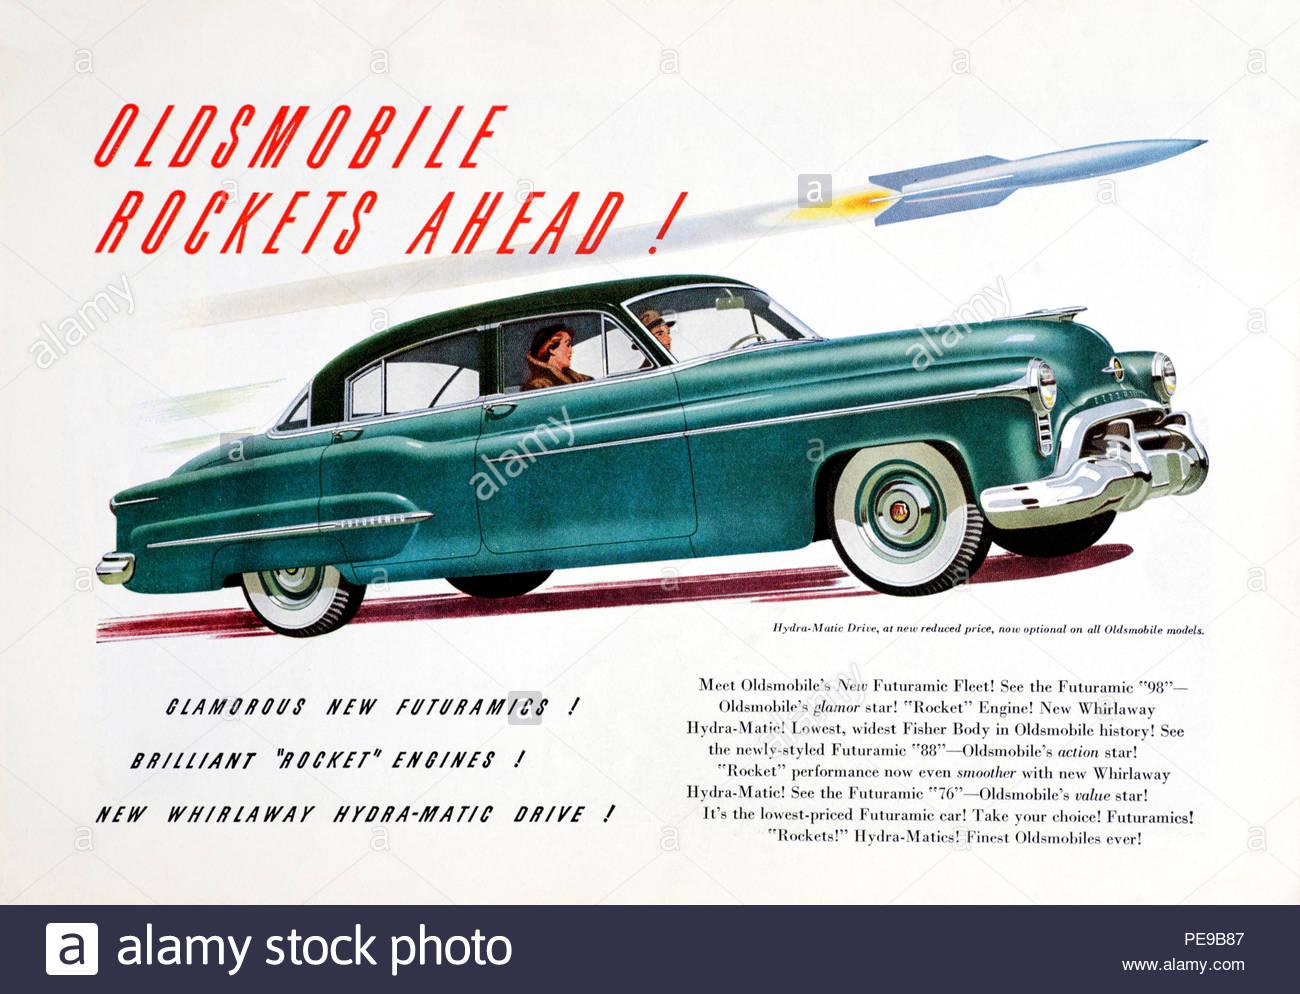 88 Oldsmobile Rocket Photos & 88 Oldsmobile Rocket Images - Alamy